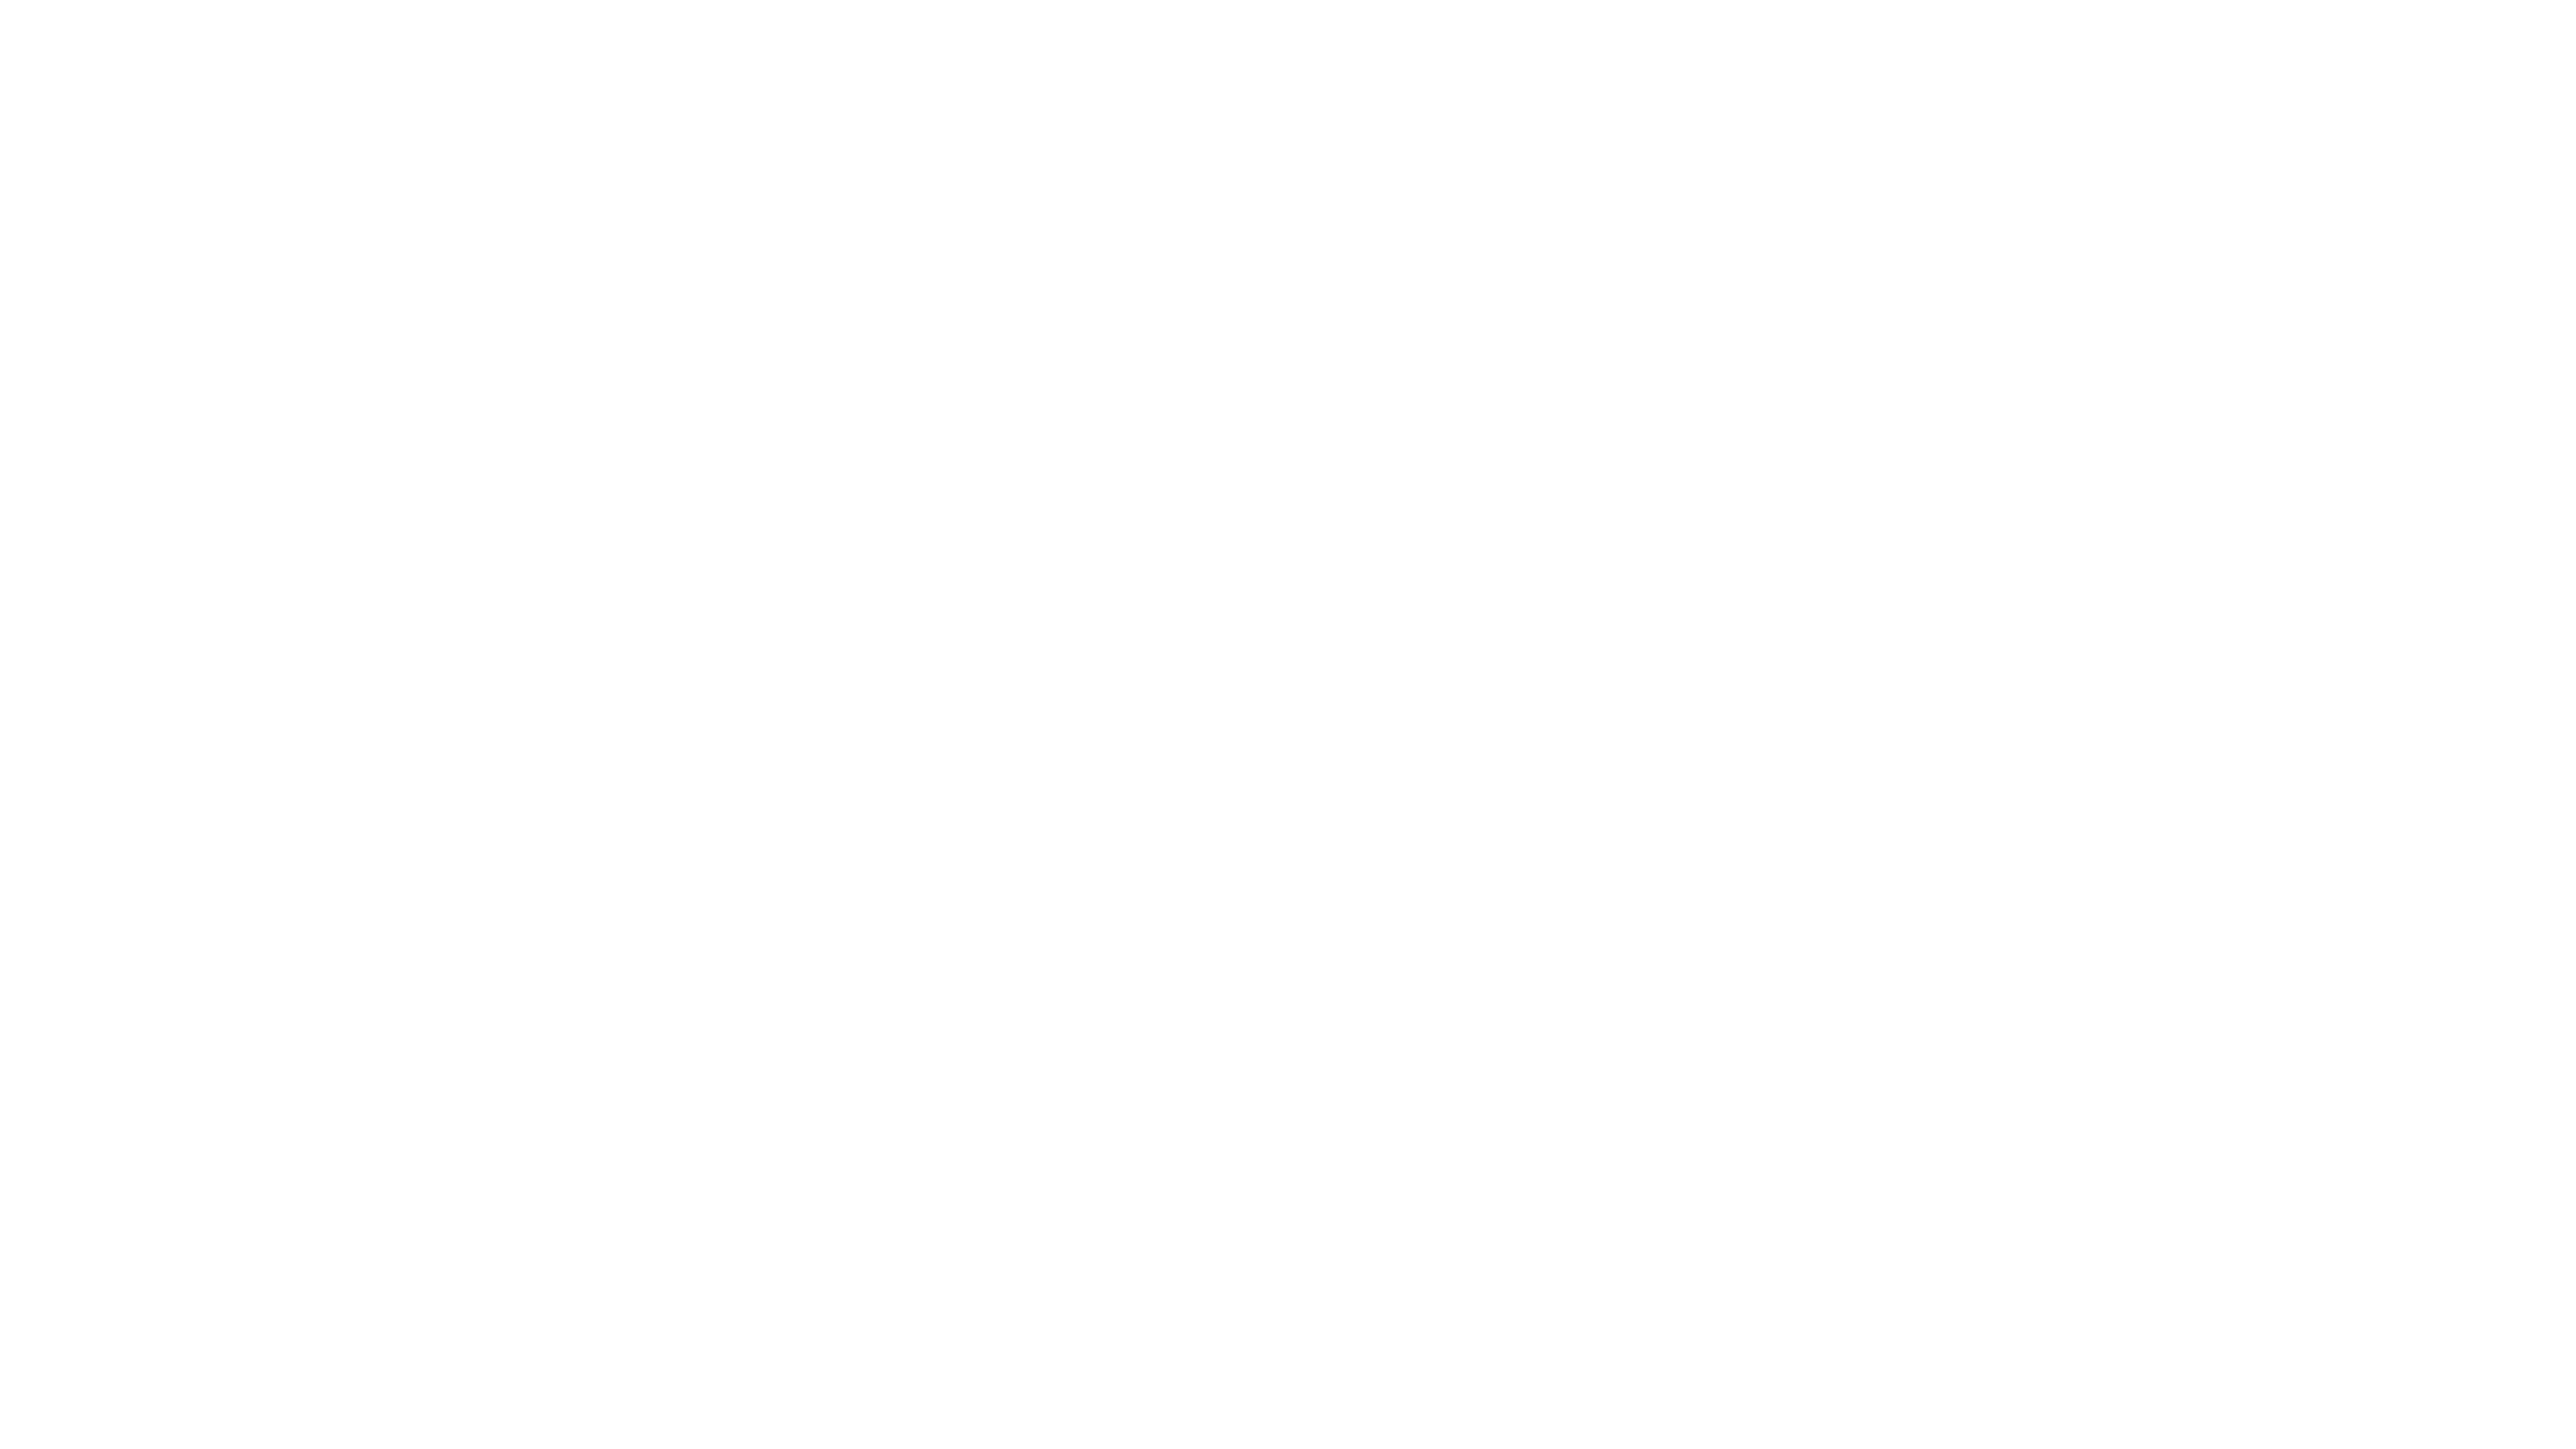 Workers Vote